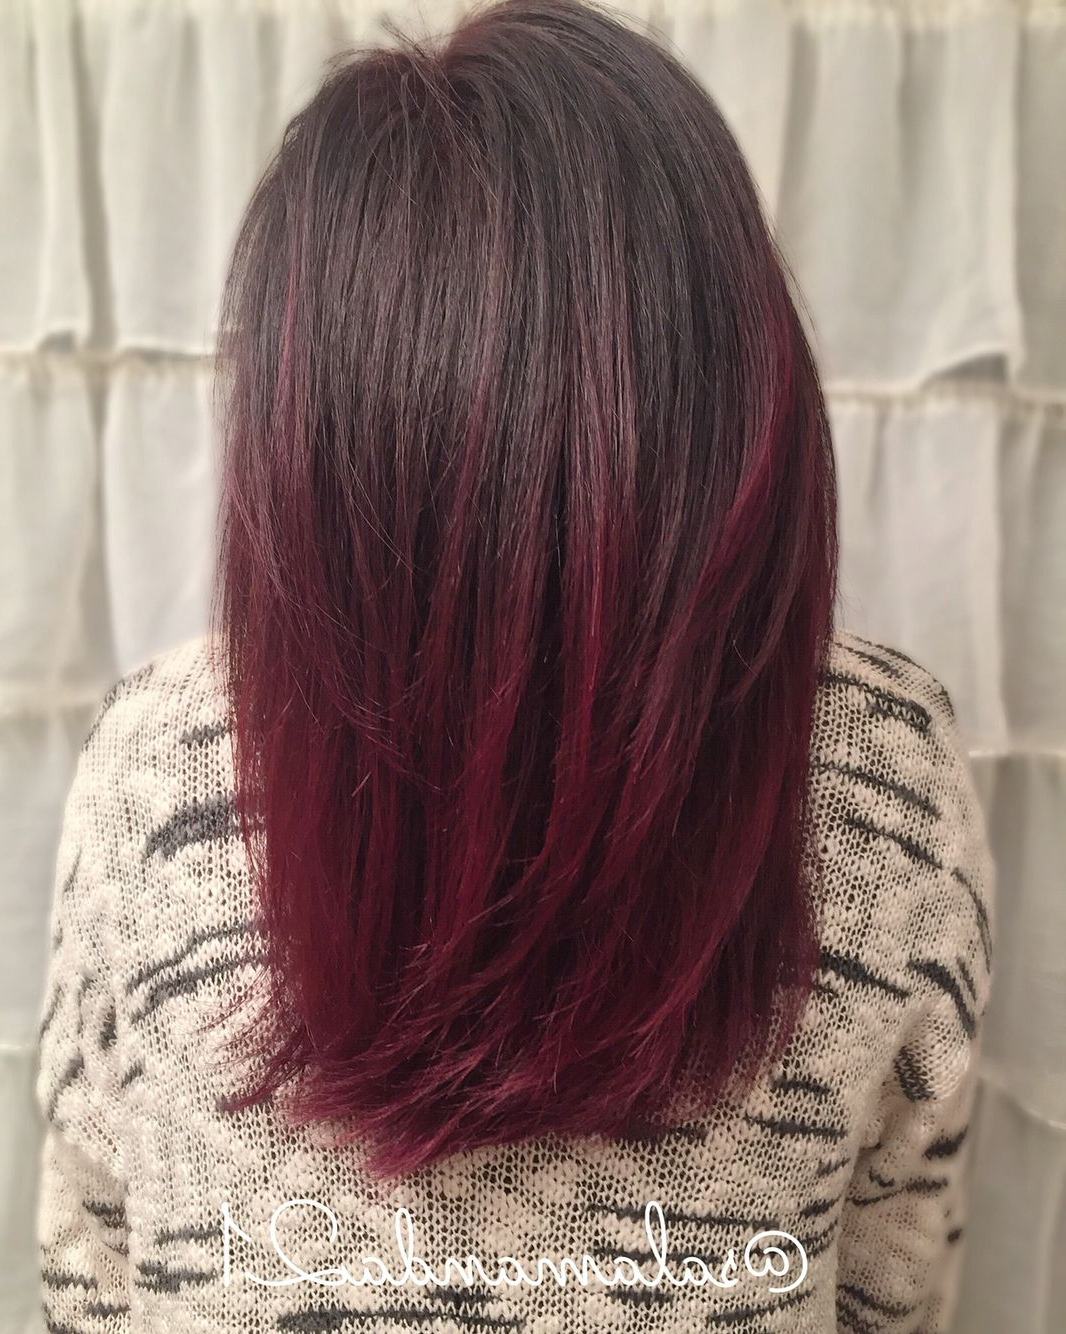 Burgundy Red Balayage   Red Balayage Hair, Red Balayage Regarding Burgundy Balayage On Dark Hairstyles (View 13 of 20)